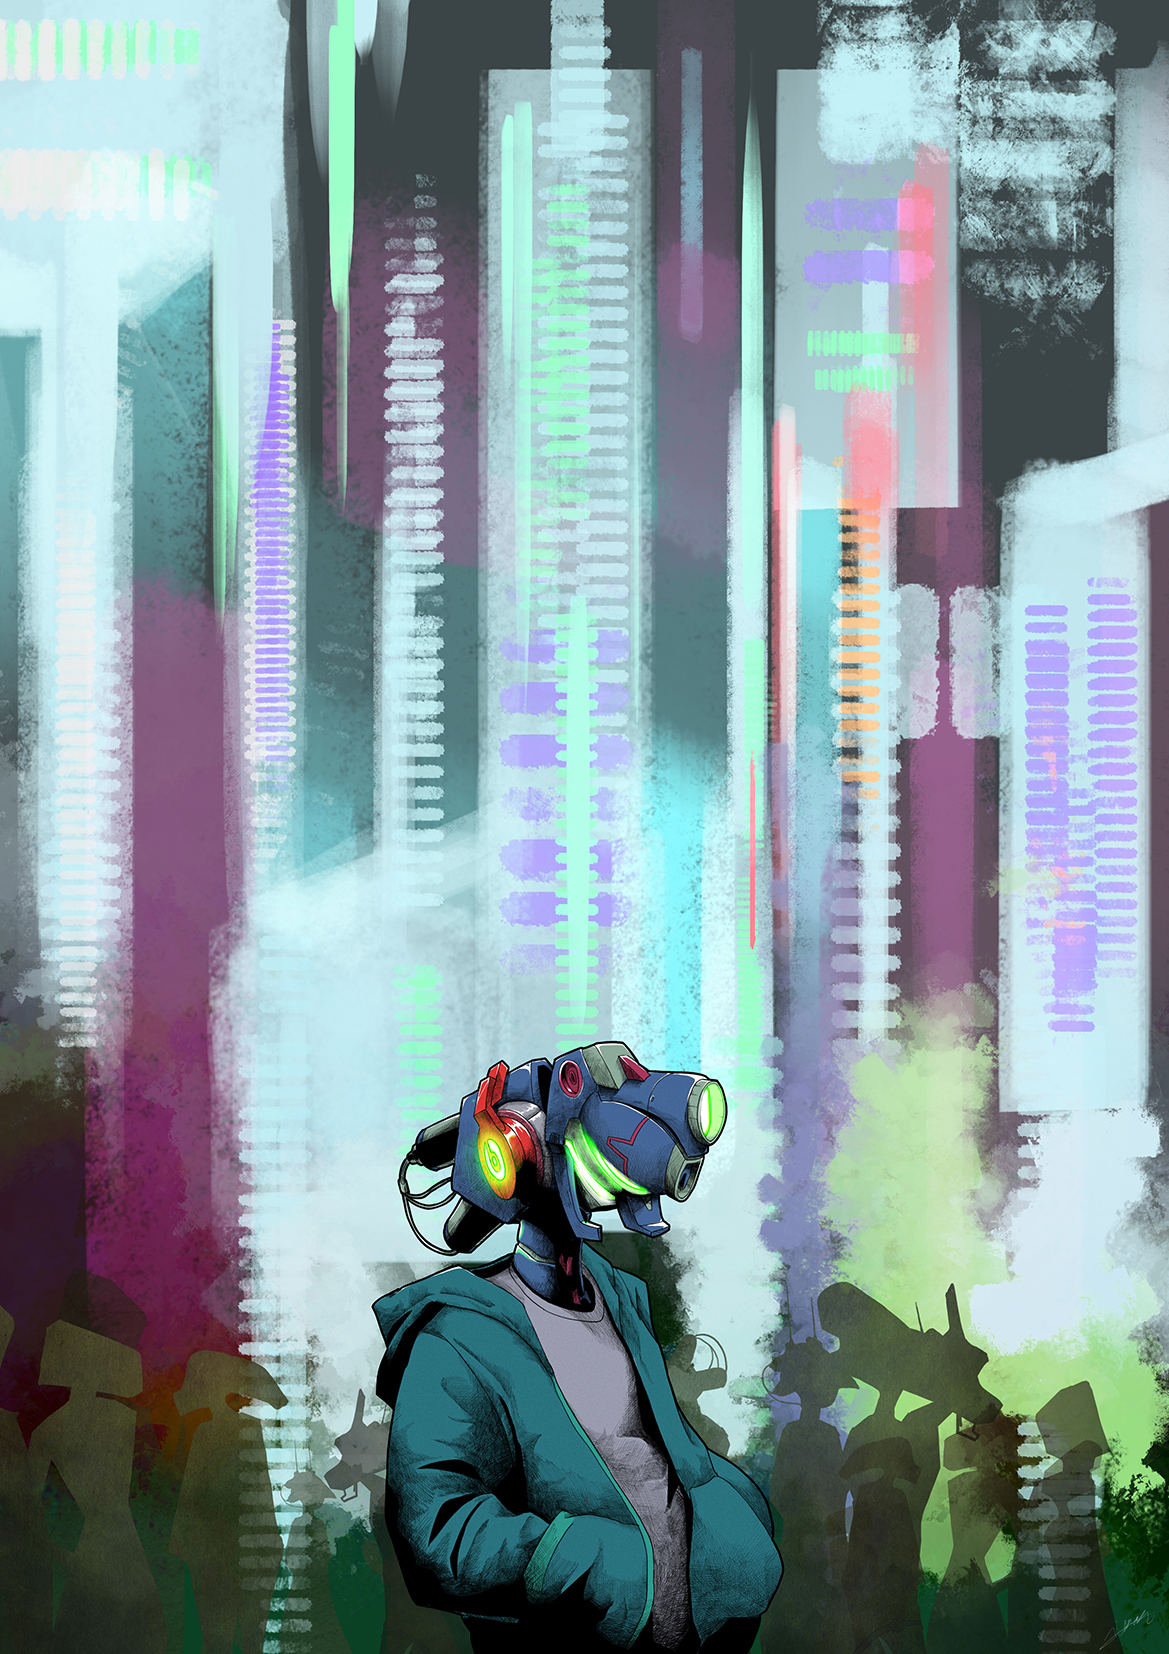 robot fashion illustration Urban Street neon logo headset music beats mech